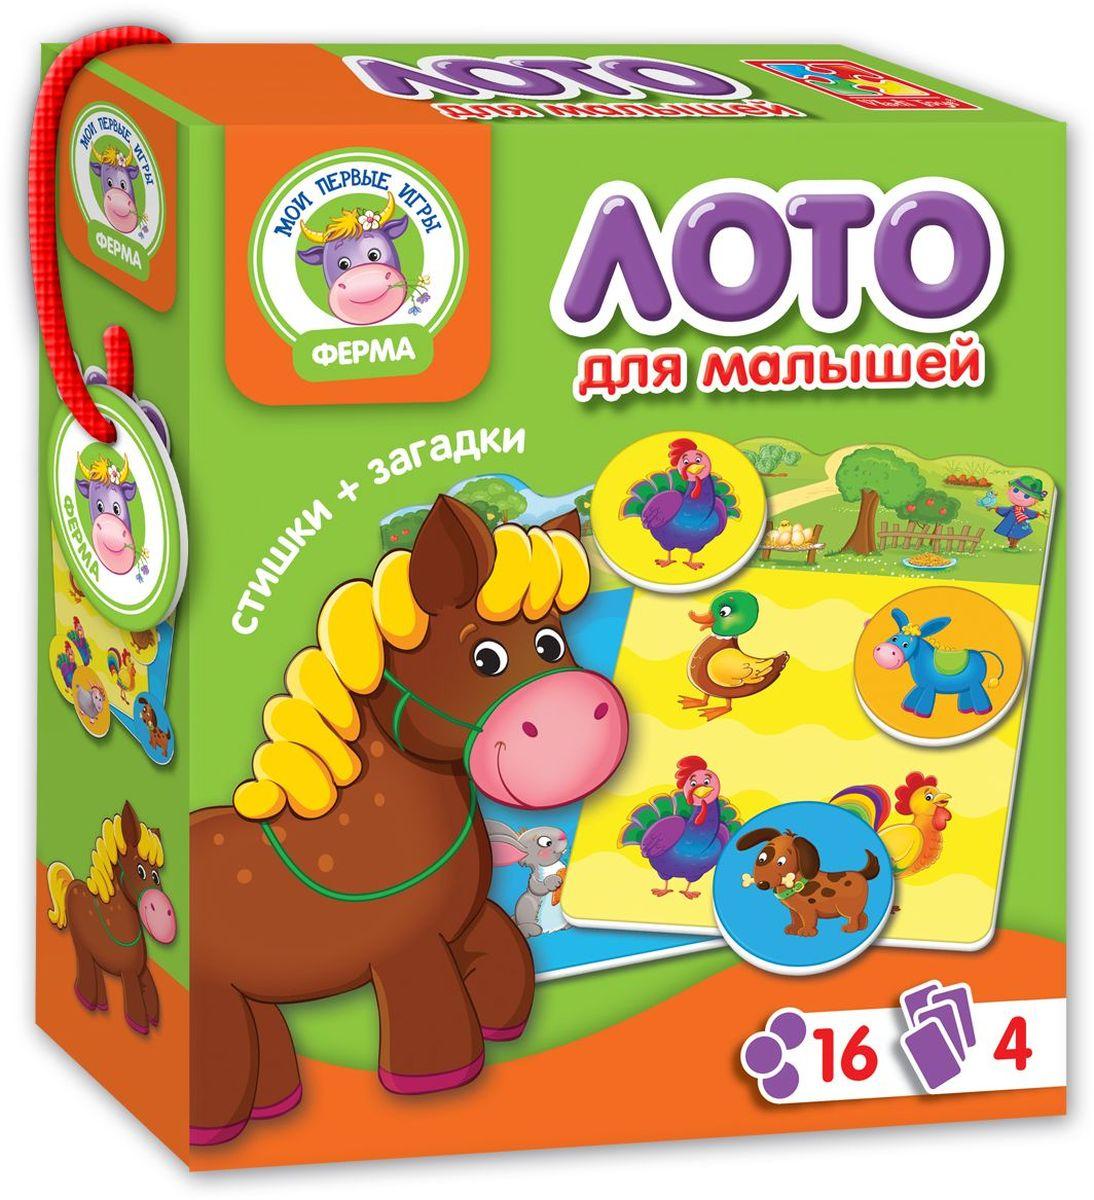 Vladi Toys Игра настольная Ферма Лото настольная игра vladi toys лото фиксики vt2107 03